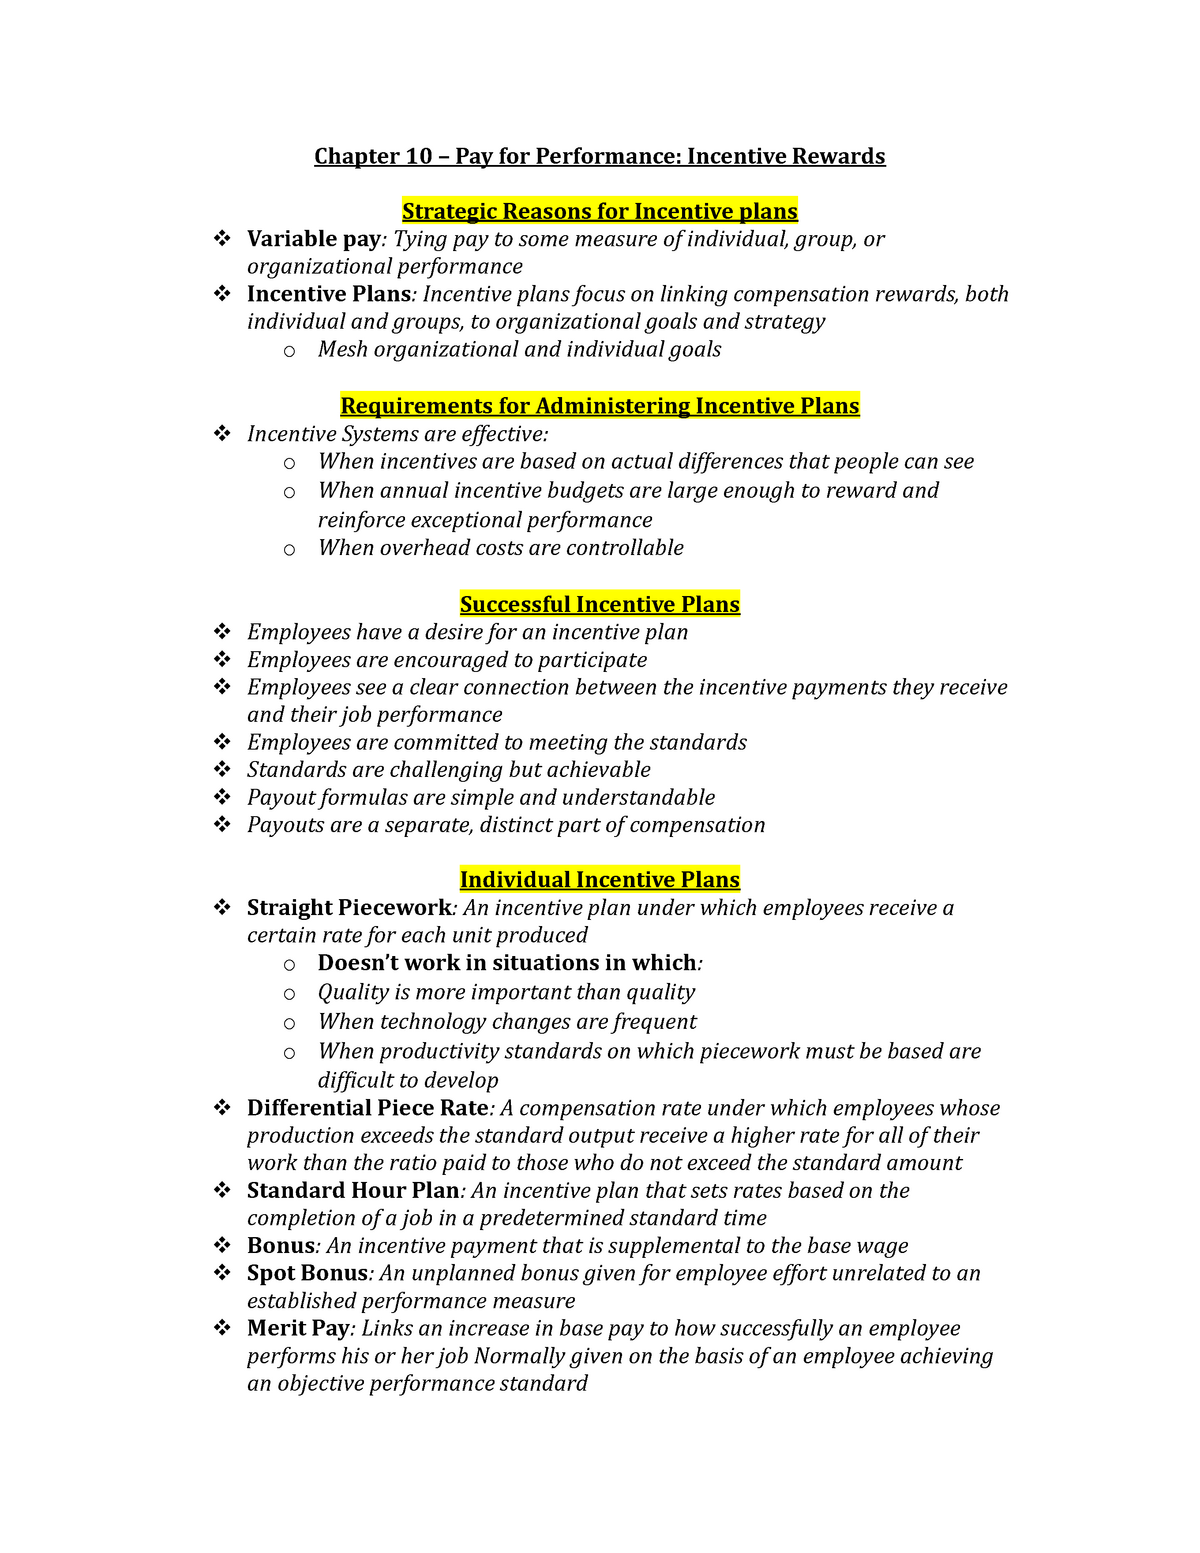 Chapter-10 - Summary Human Resource Management - ADM2337 - StuDocu